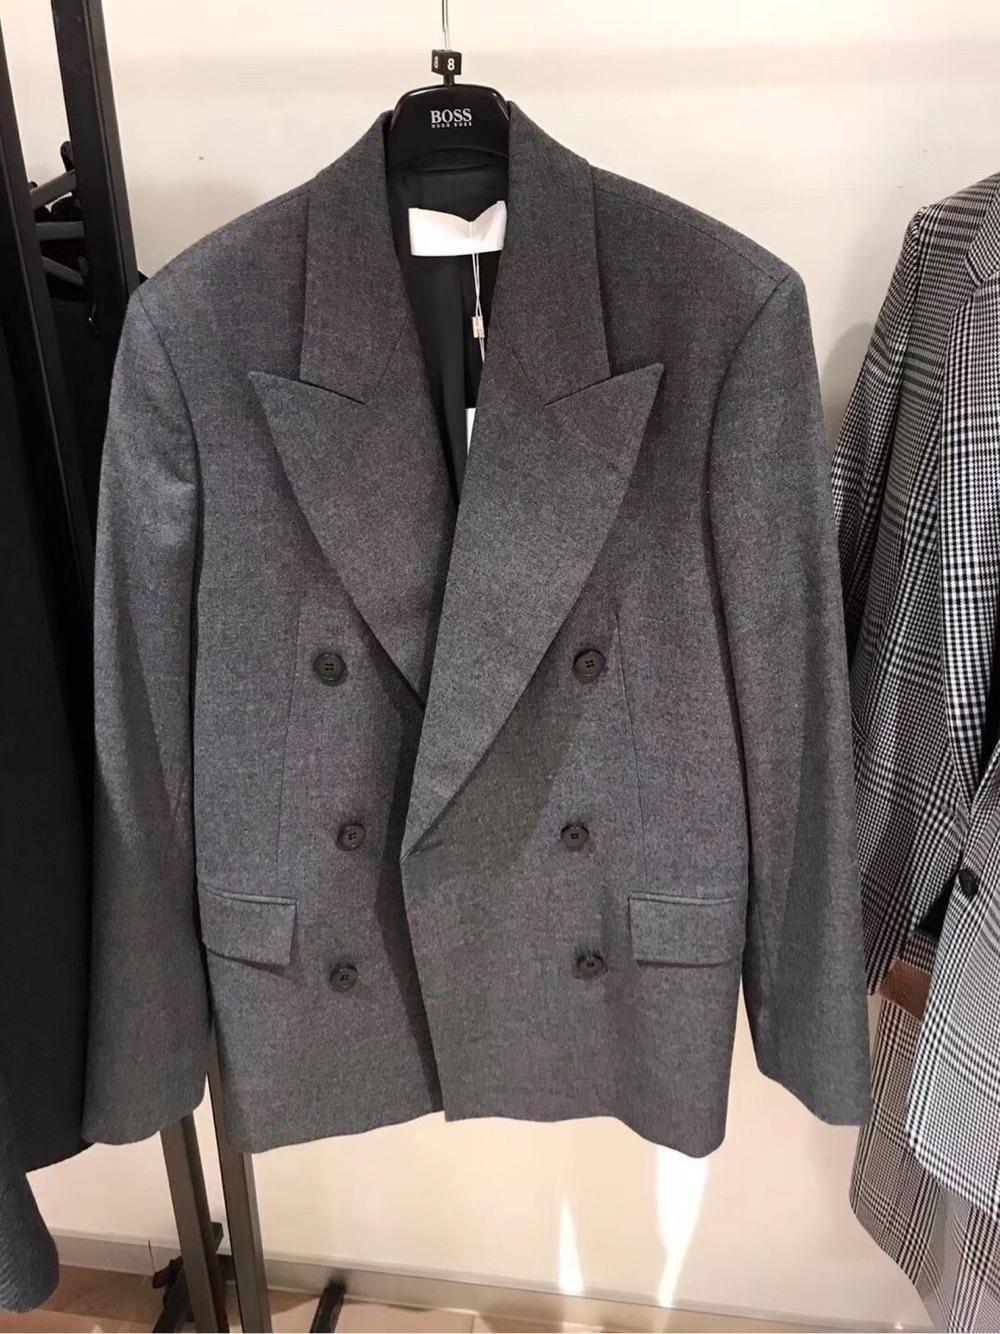 Boss 西服外套,特价2190